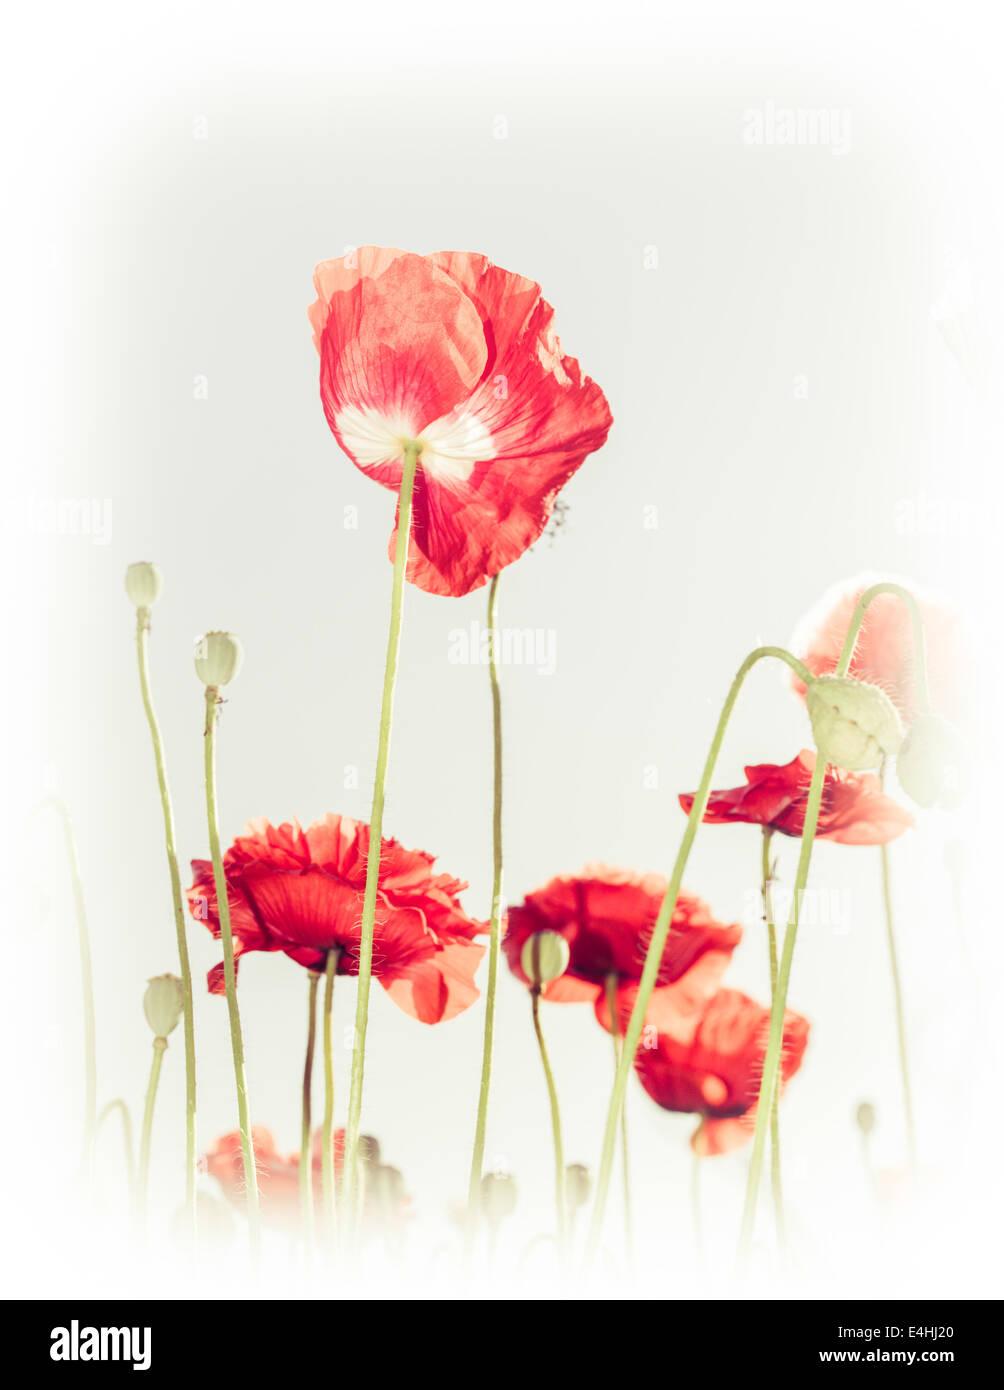 Wild poppy flowers on summer meadow - Stock Image